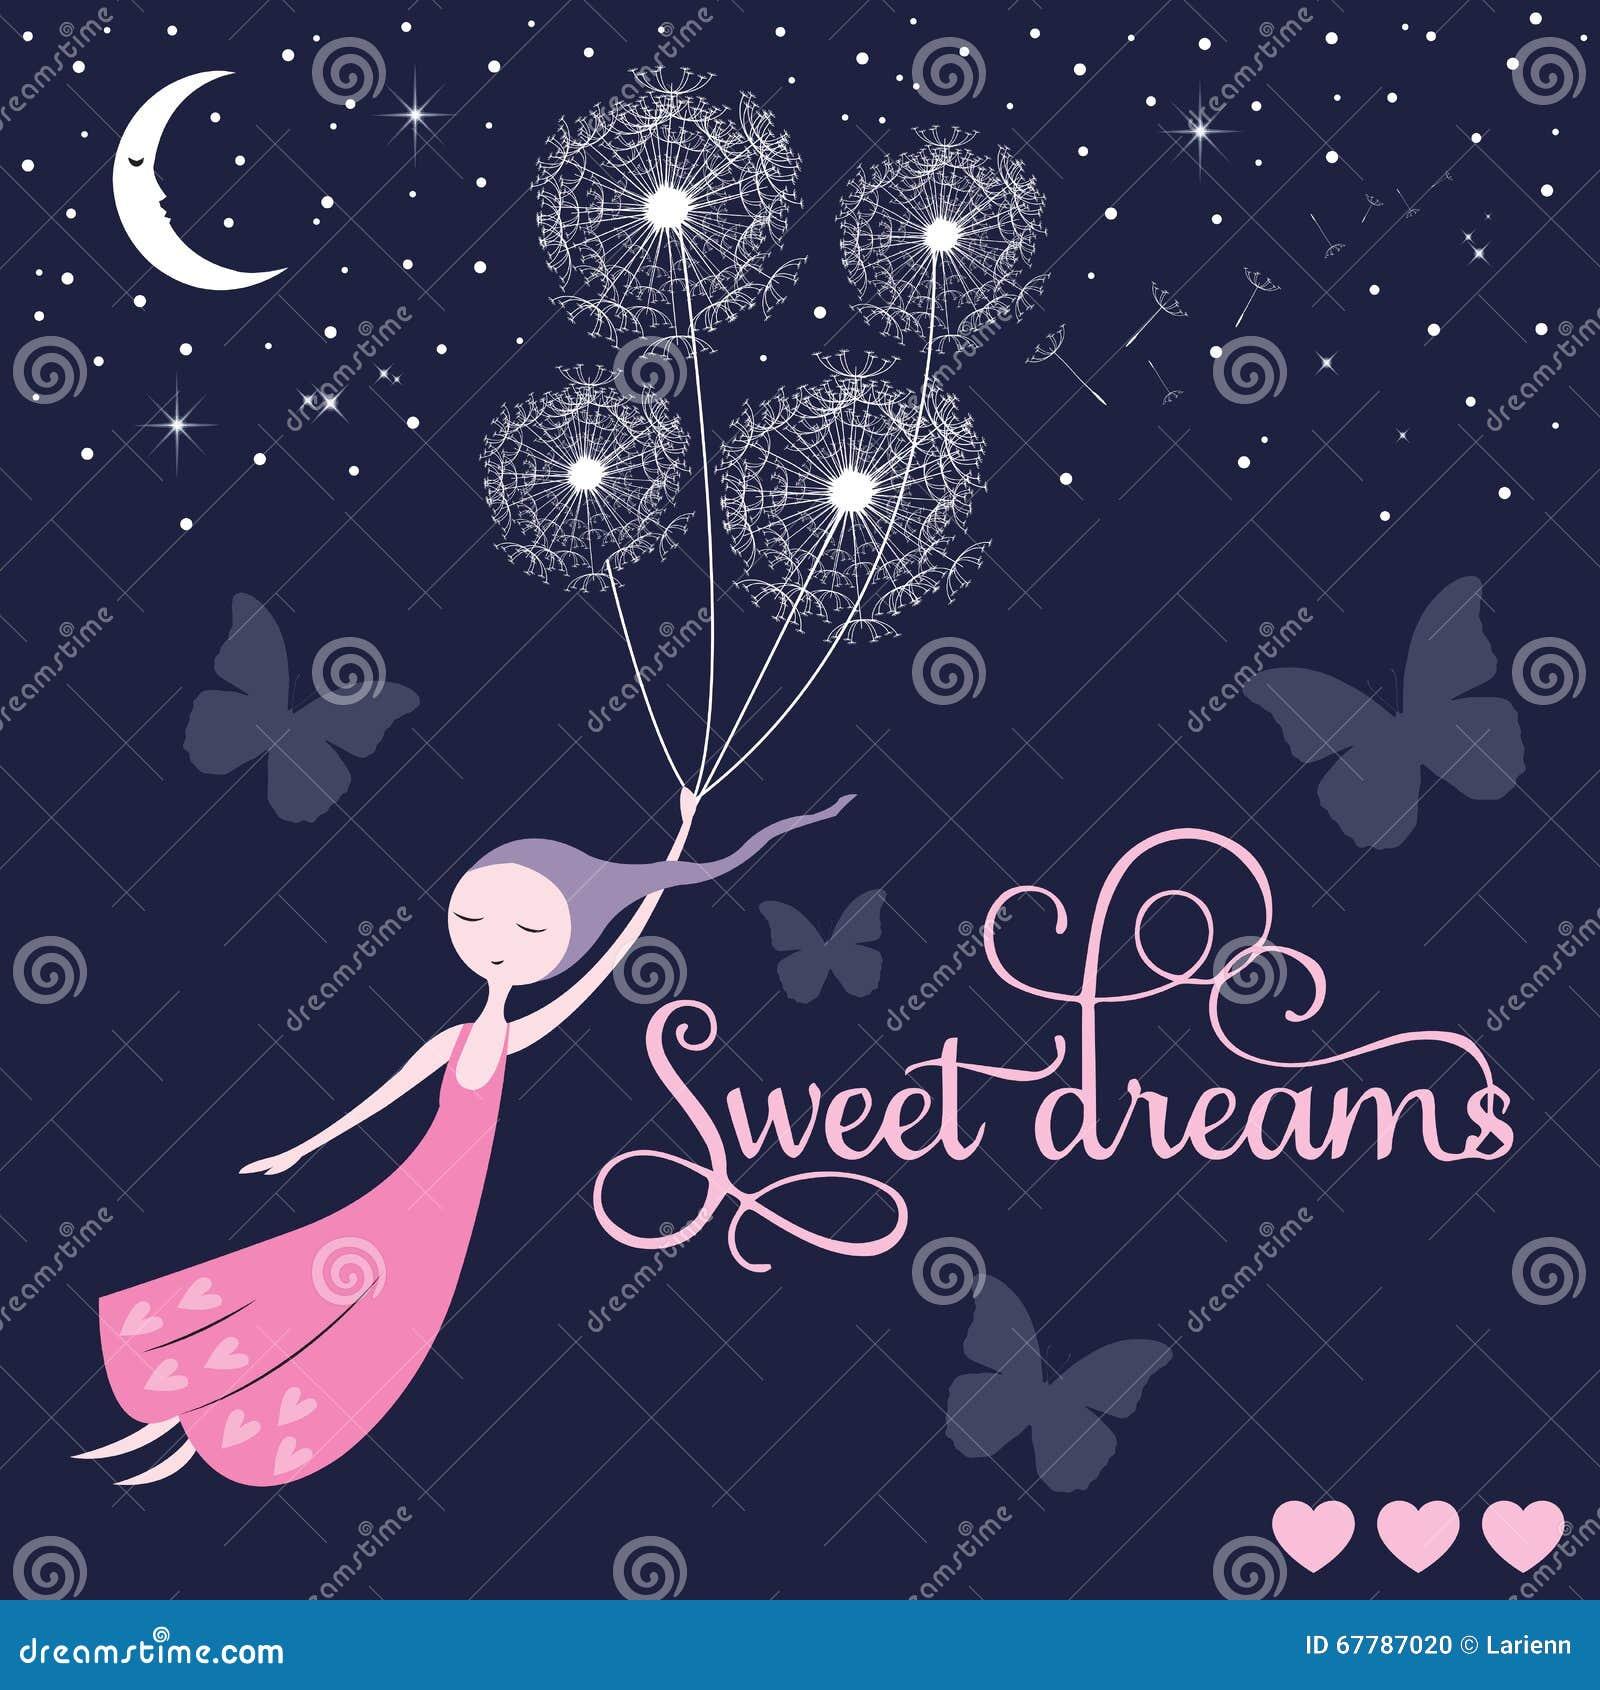 Sweet Dreams Girl Vector Stock Vector Illustration Of Dreams 67787020